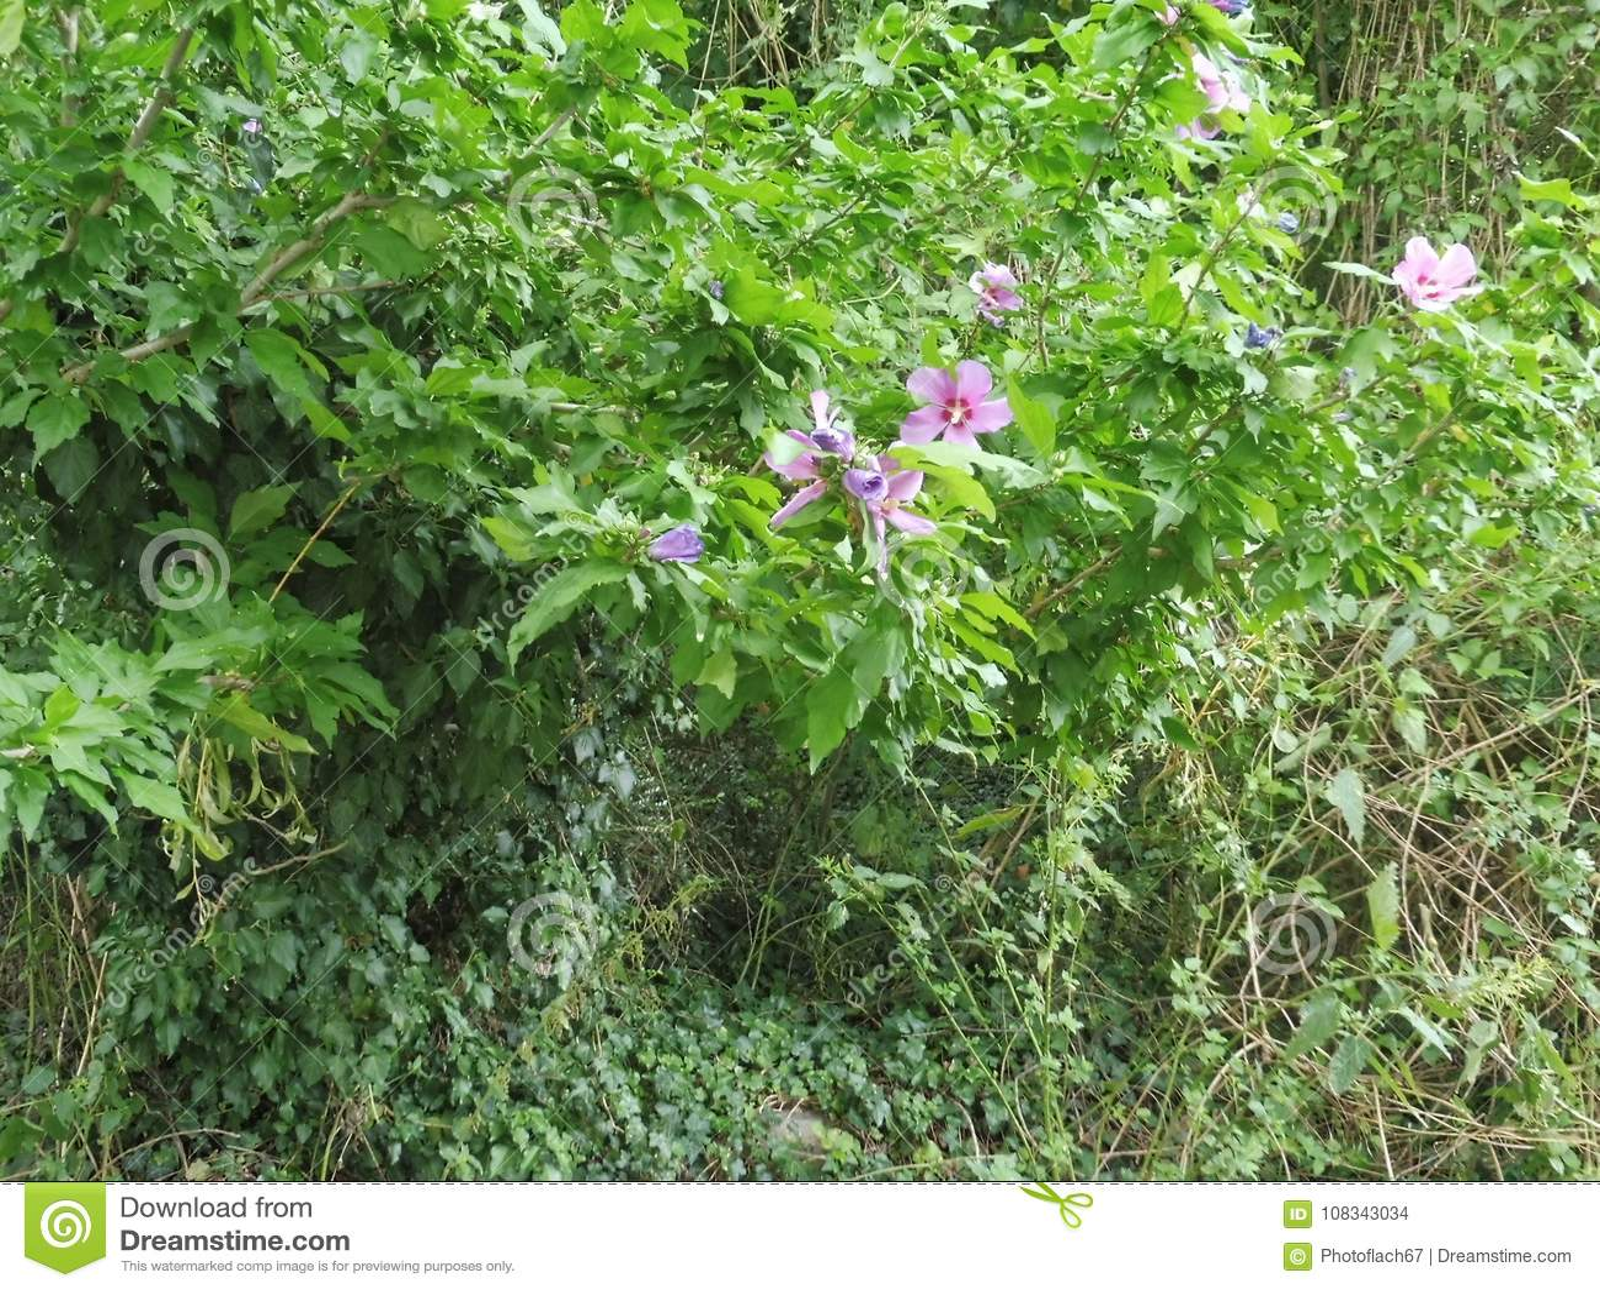 Flower Green Sappy Relaxing Restful Soothing Refreshing Background Bottom Wallpaper Vegetation